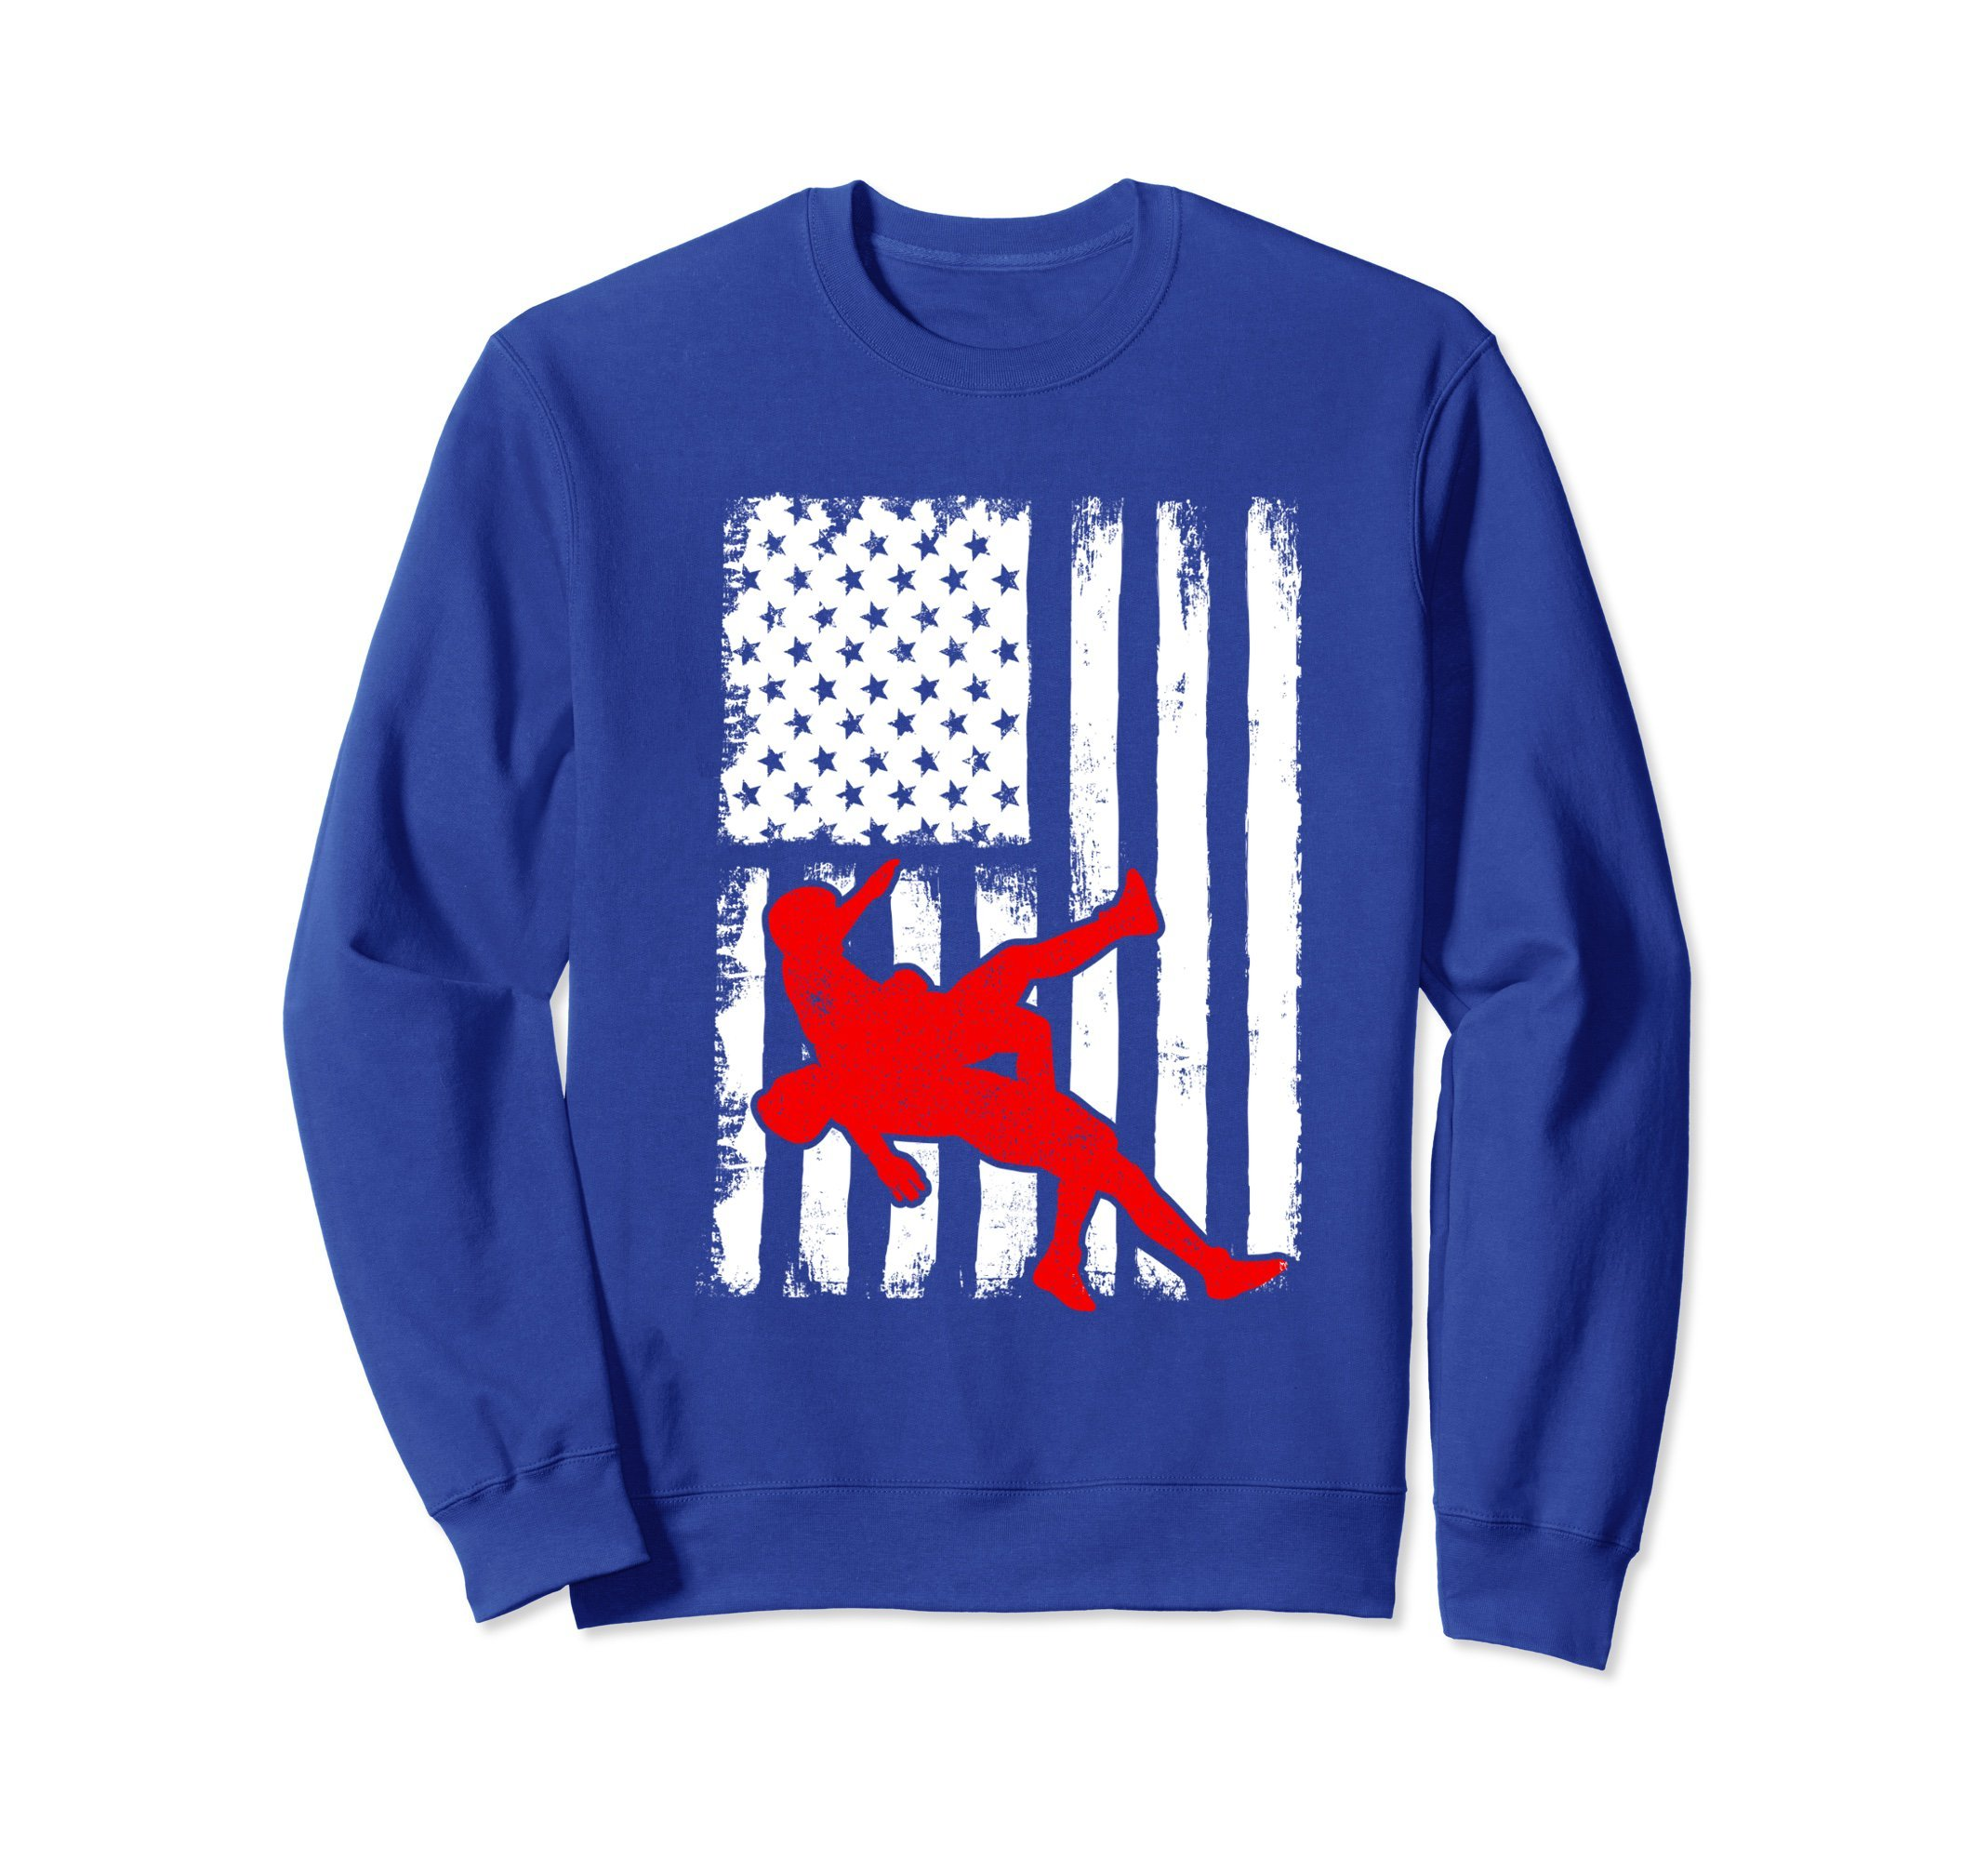 Unisex USA Flag Wrestling Sweatshirt for Wrestlers, Gift, Red Medium Royal Blue by Wrestling Shirts and Wrestling Shoes